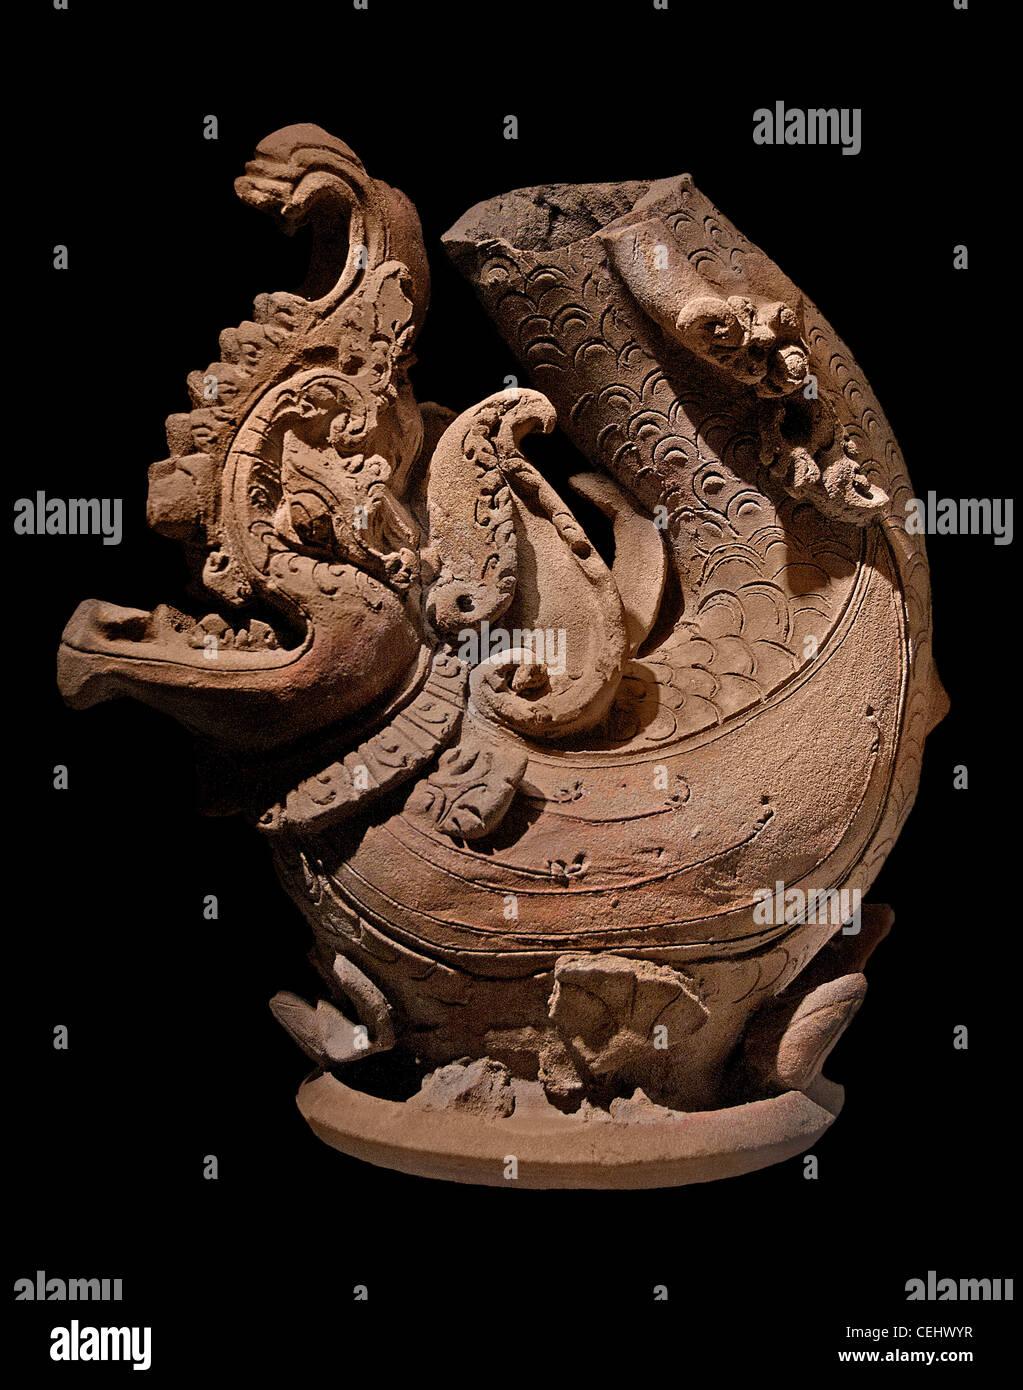 Makara - Trawulan Mojopahit art east Java 14 - 15 century  Indonesia pottery - Stock Image